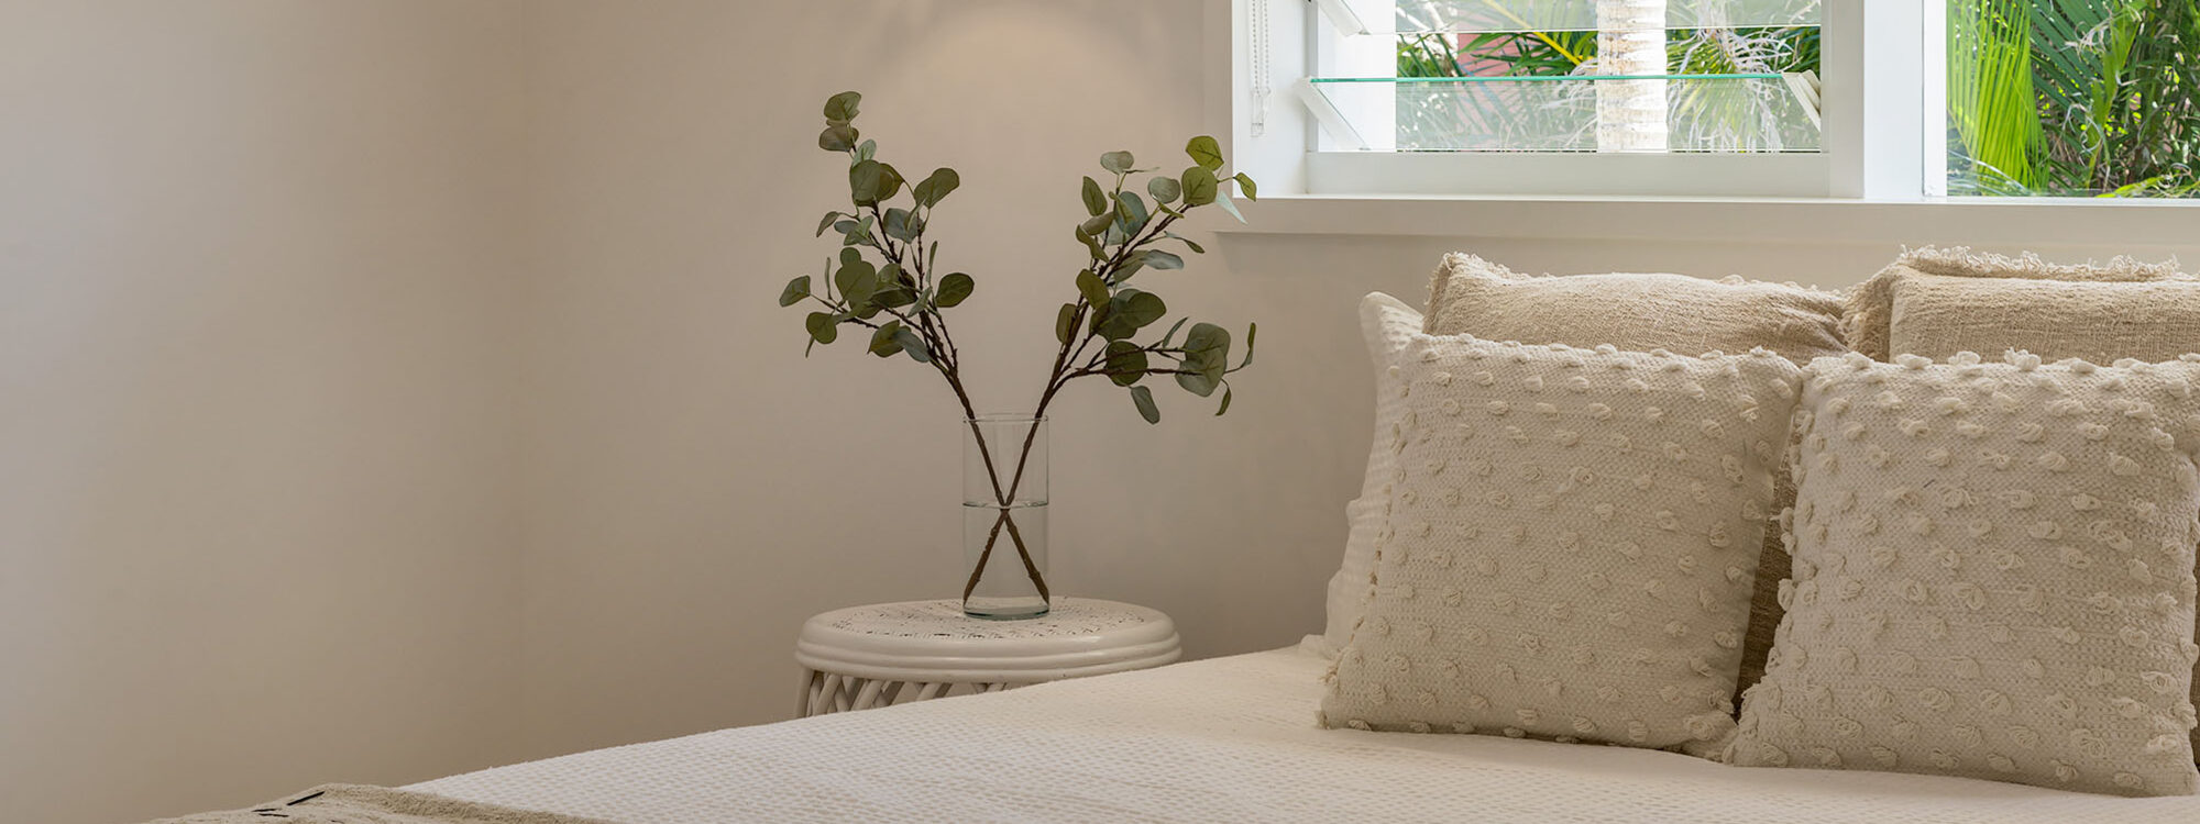 Castaway on Tallows - Byron Bay - Bedroom 3